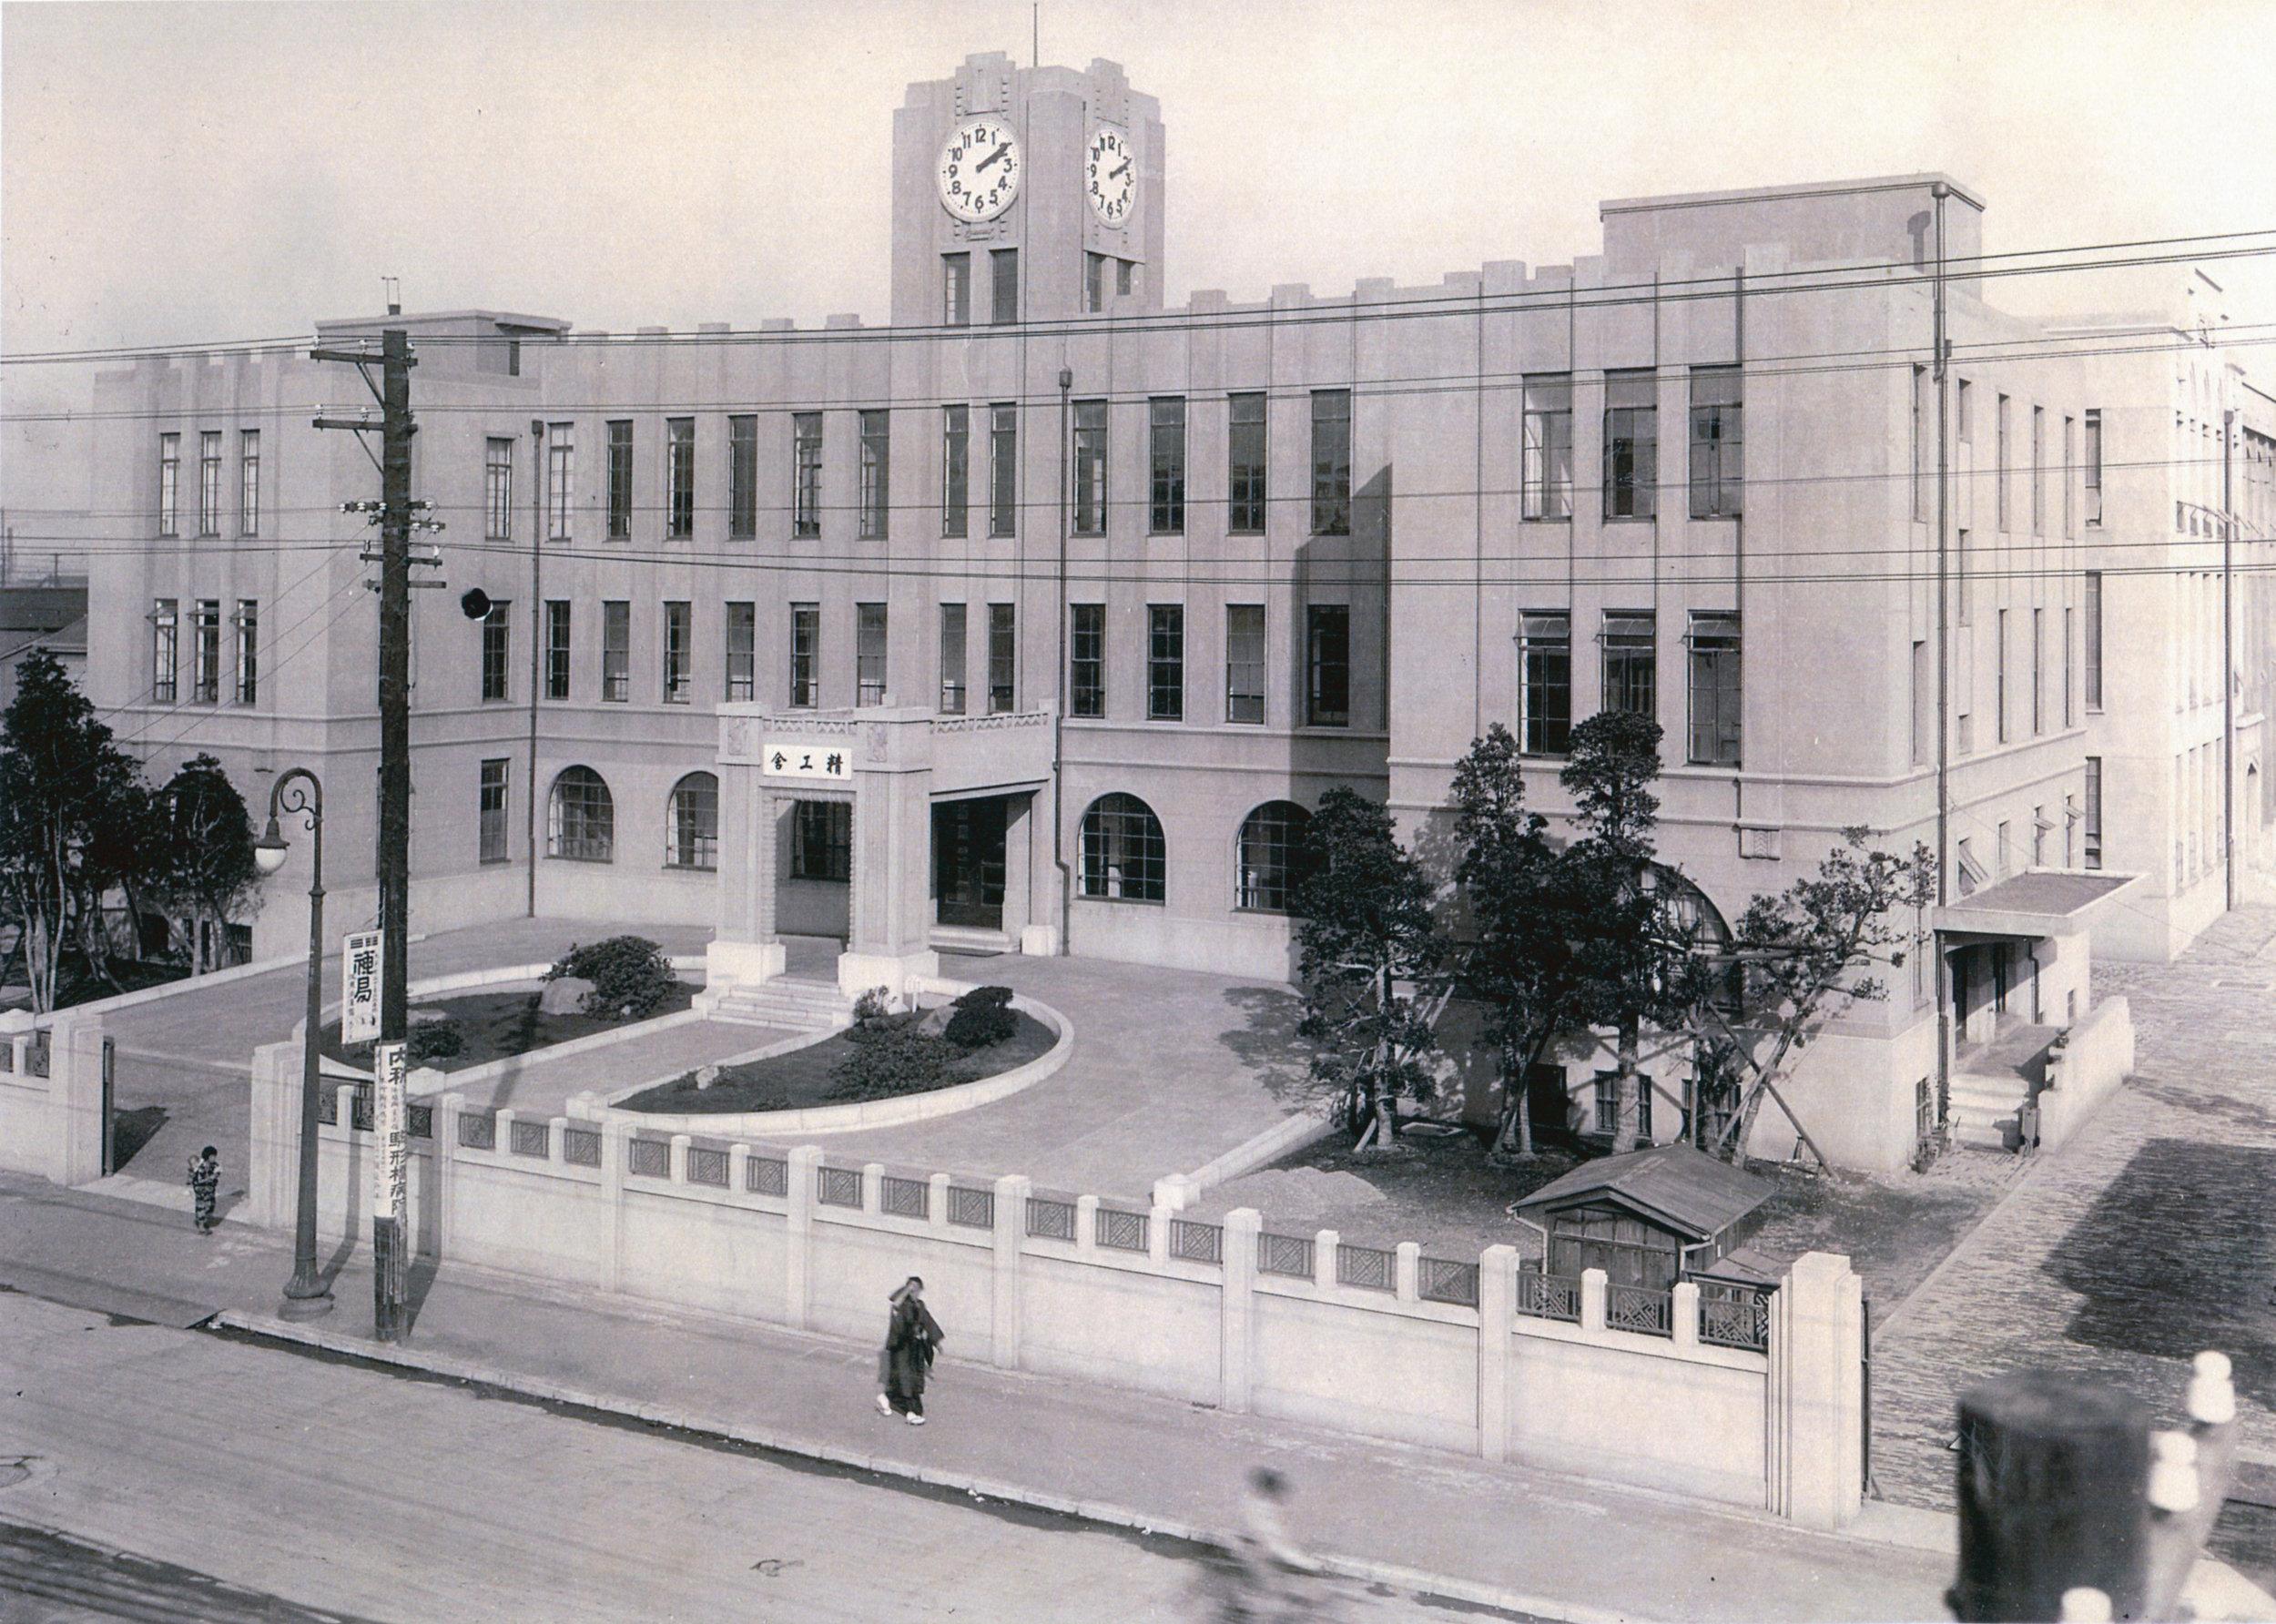 Seikosha Factory ~1935